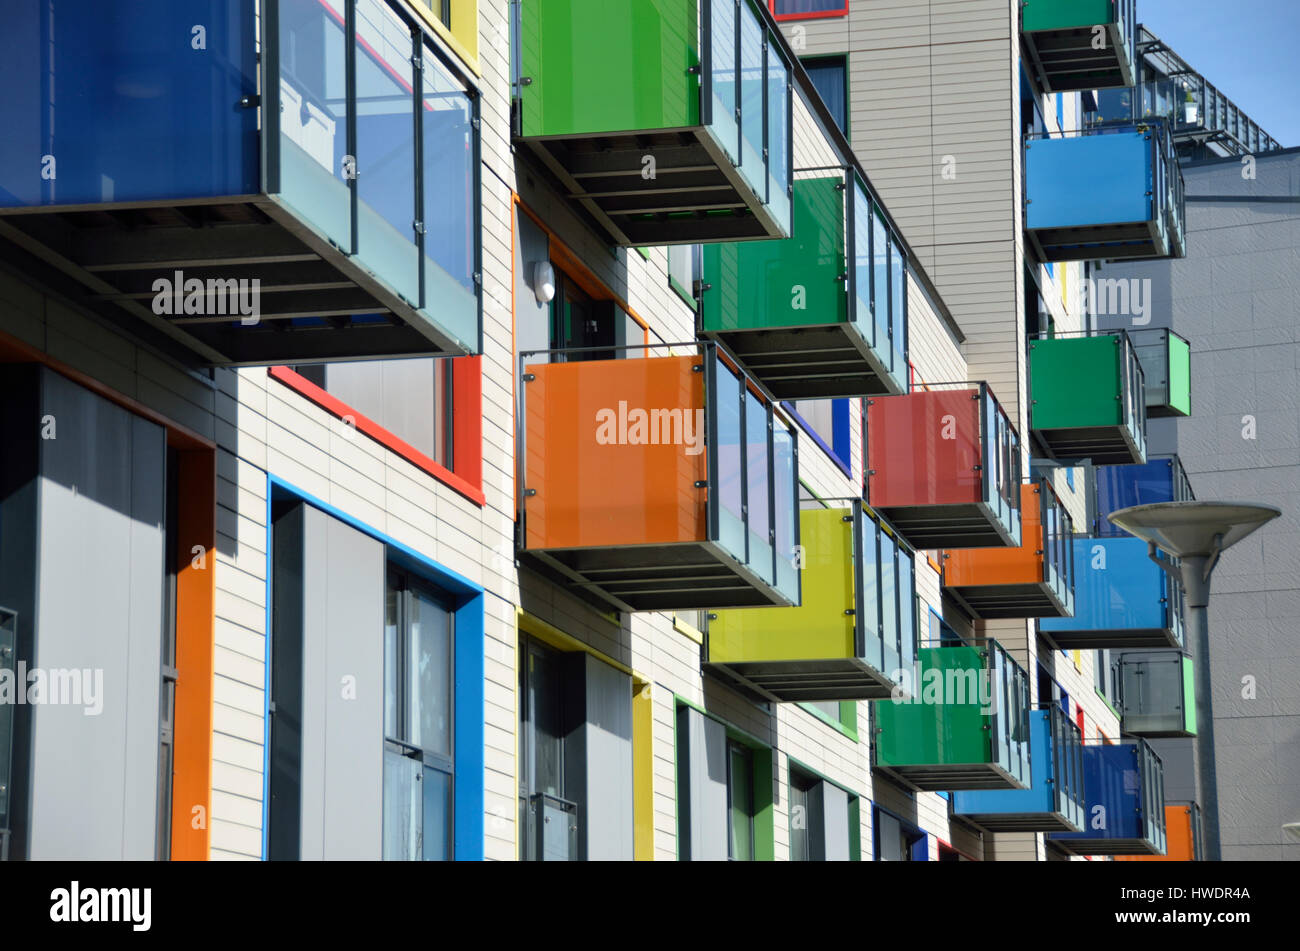 Colourful apartment exteriors in Hale Village, Tottenham Hale, London, UK. - Stock Image